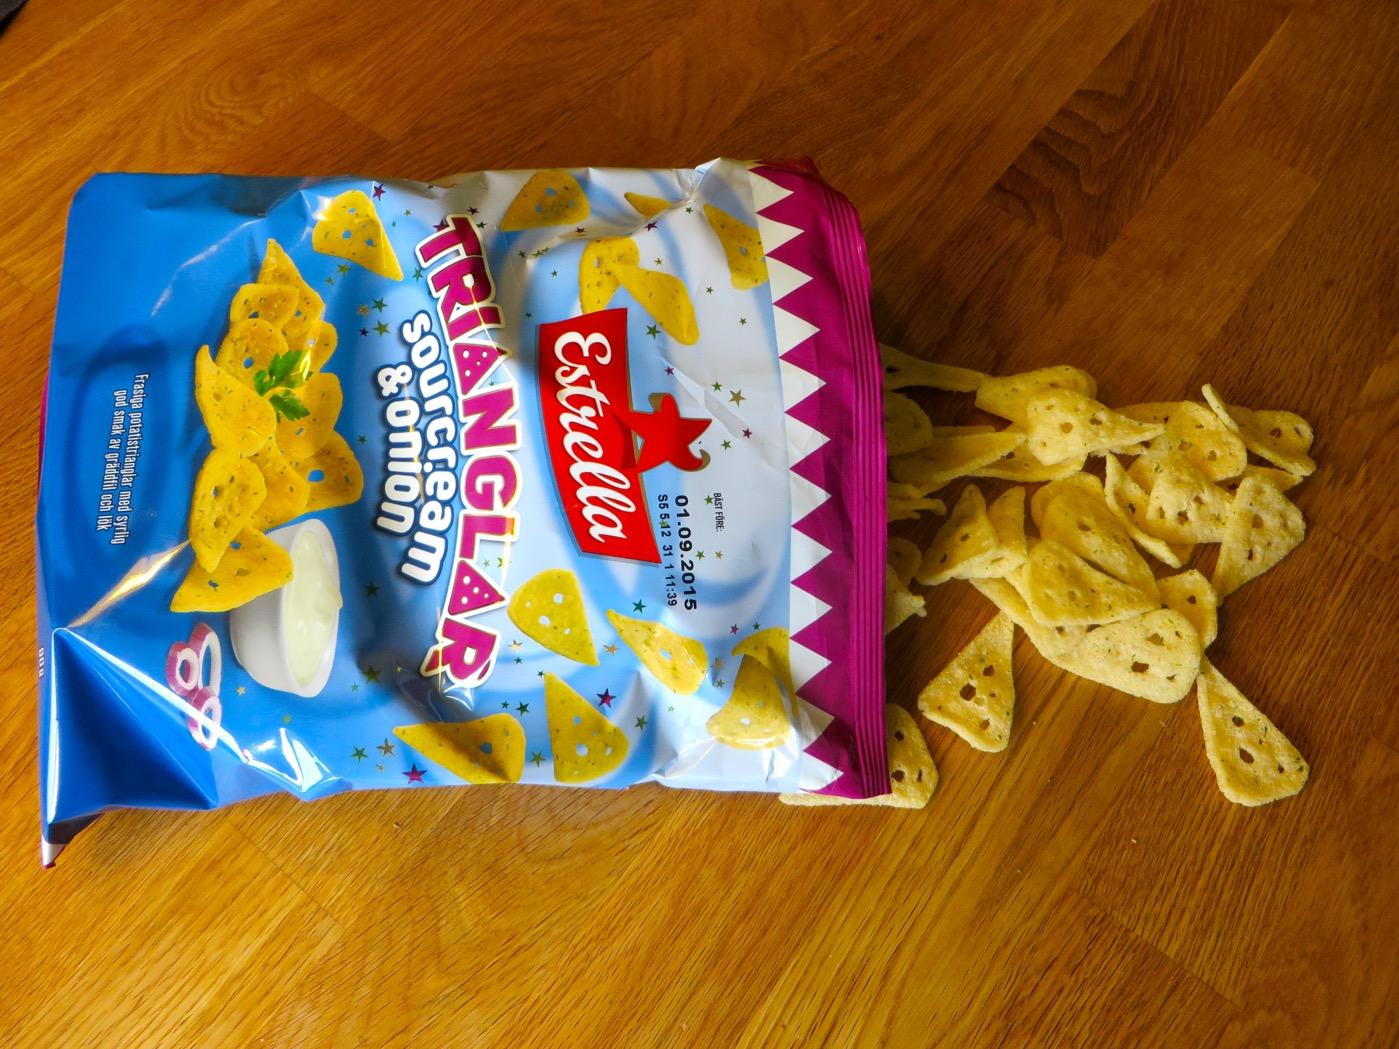 Senaste nyheten inom Estrellas impulsserie - Trianglar Sourcream & onion.